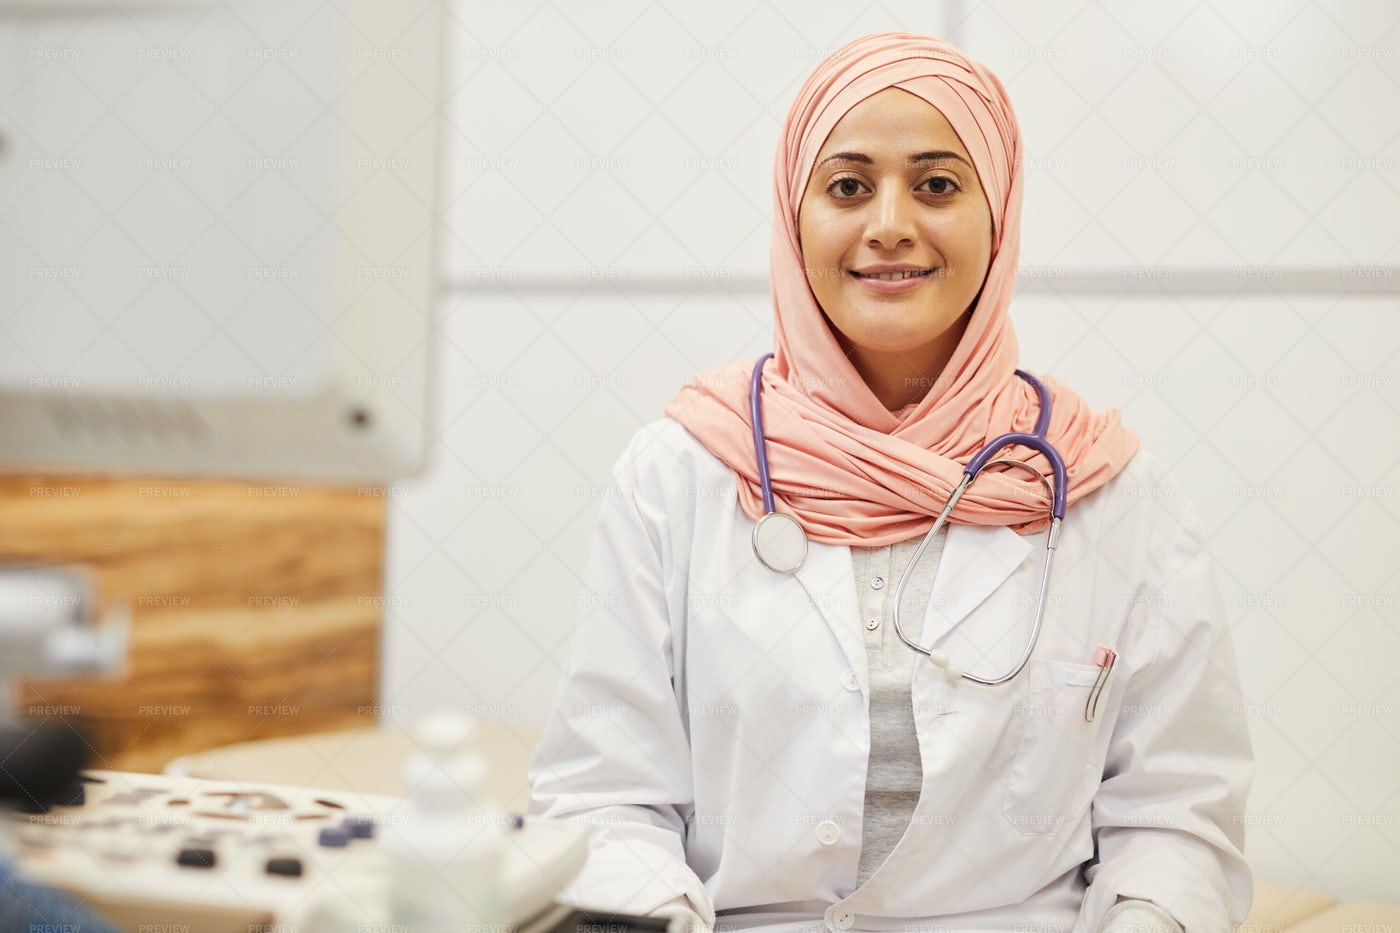 Middle-Eastern Nurse Posing In...: Stock Photos